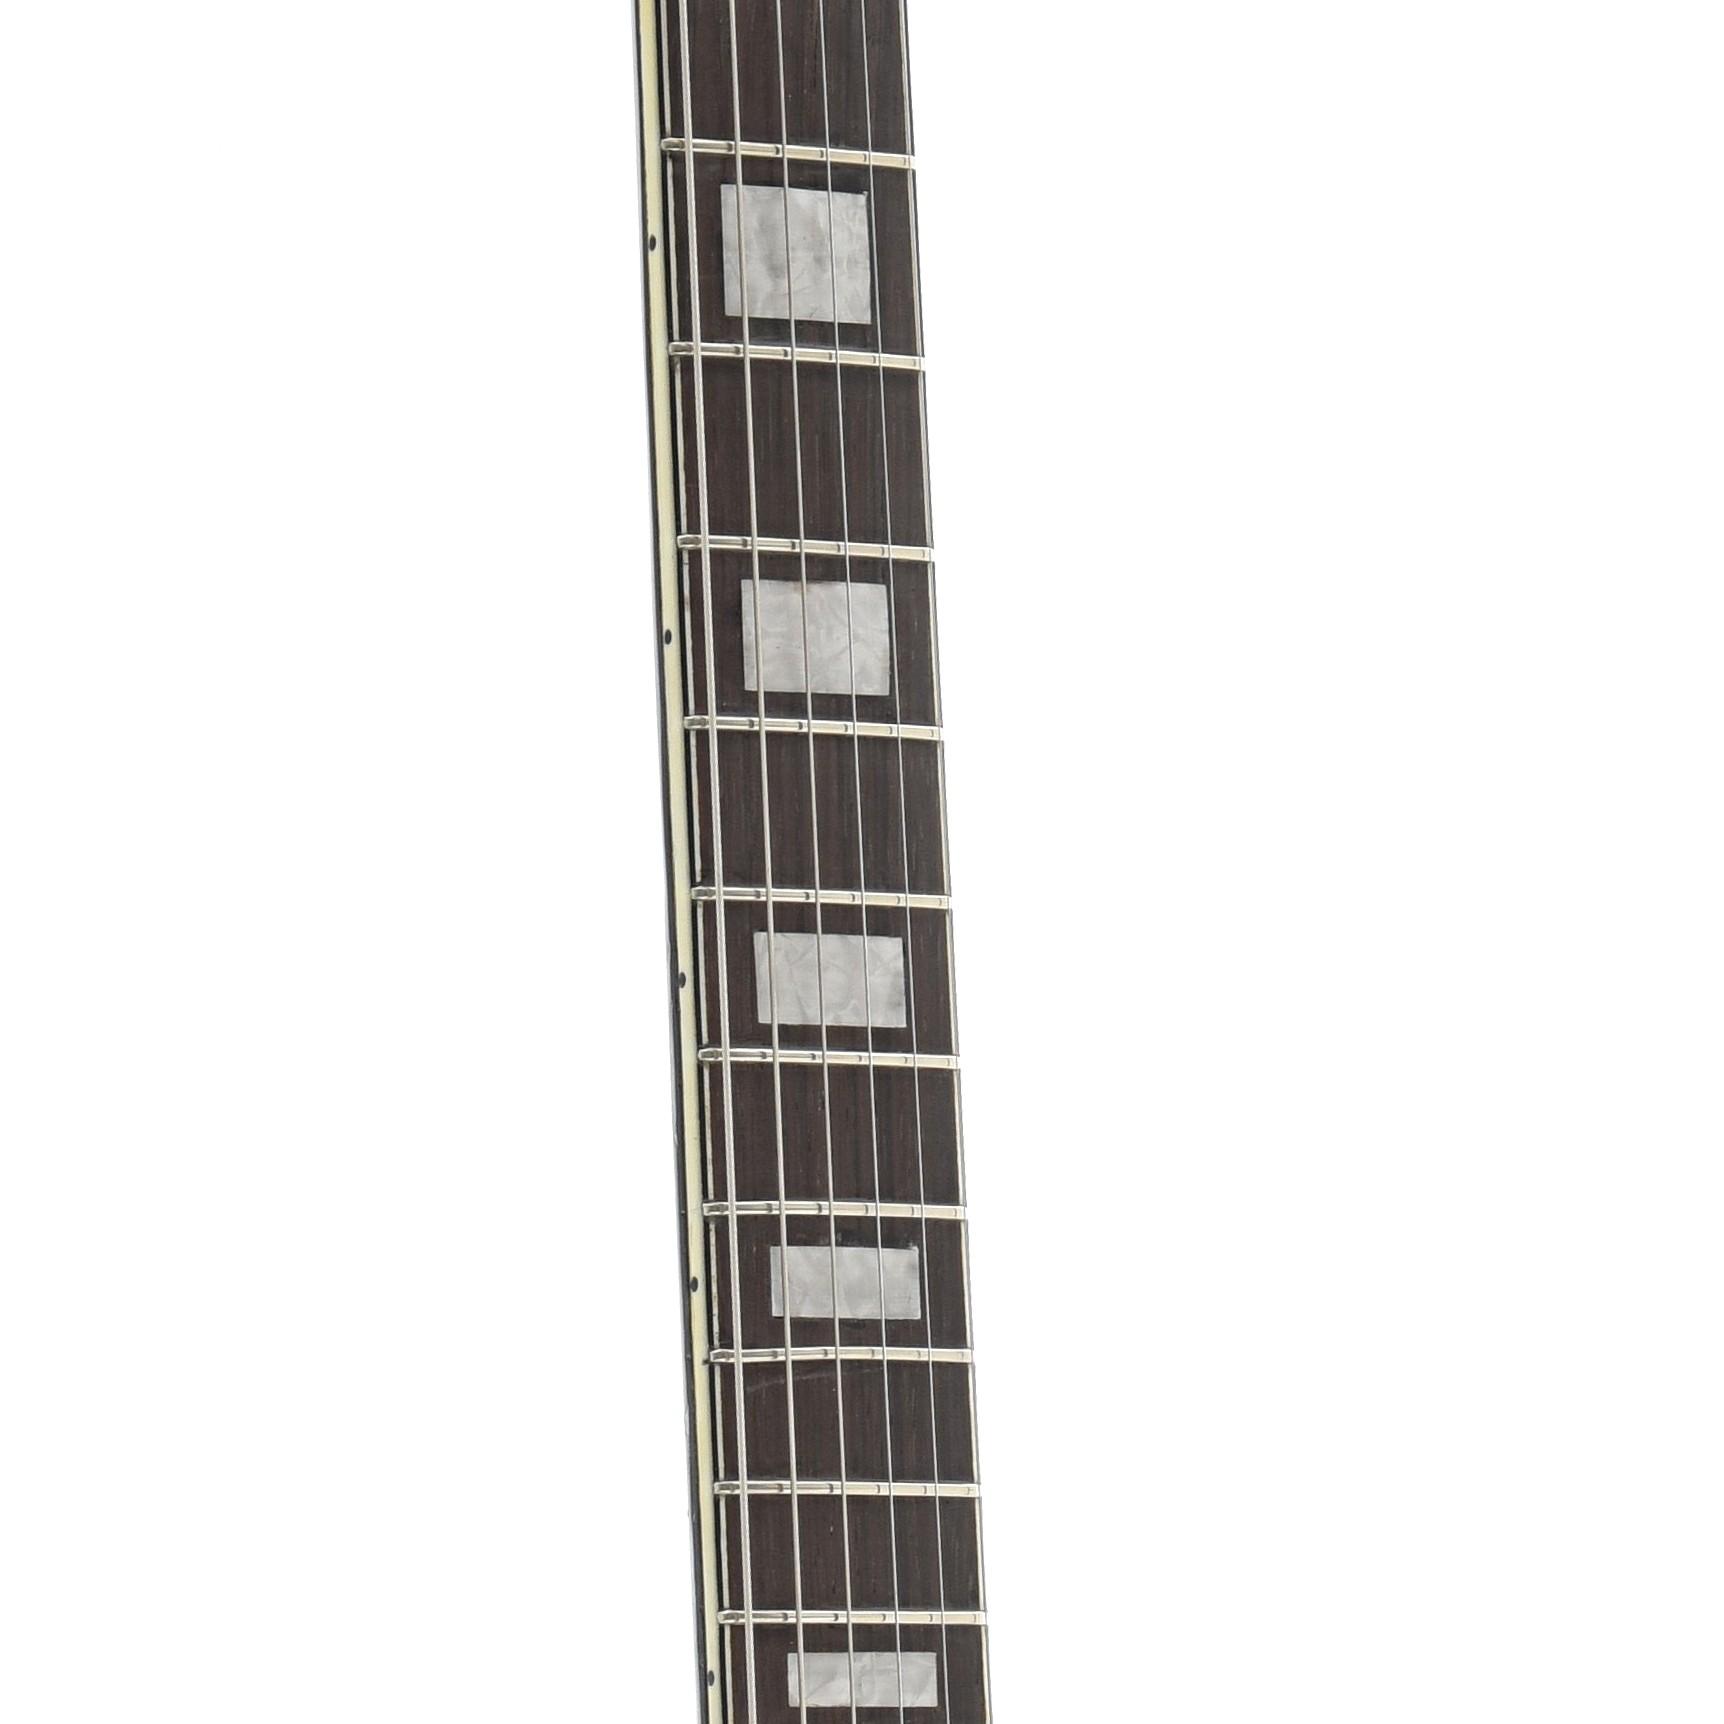 1724x1724 Harmony Silhouette H 19 (1965)